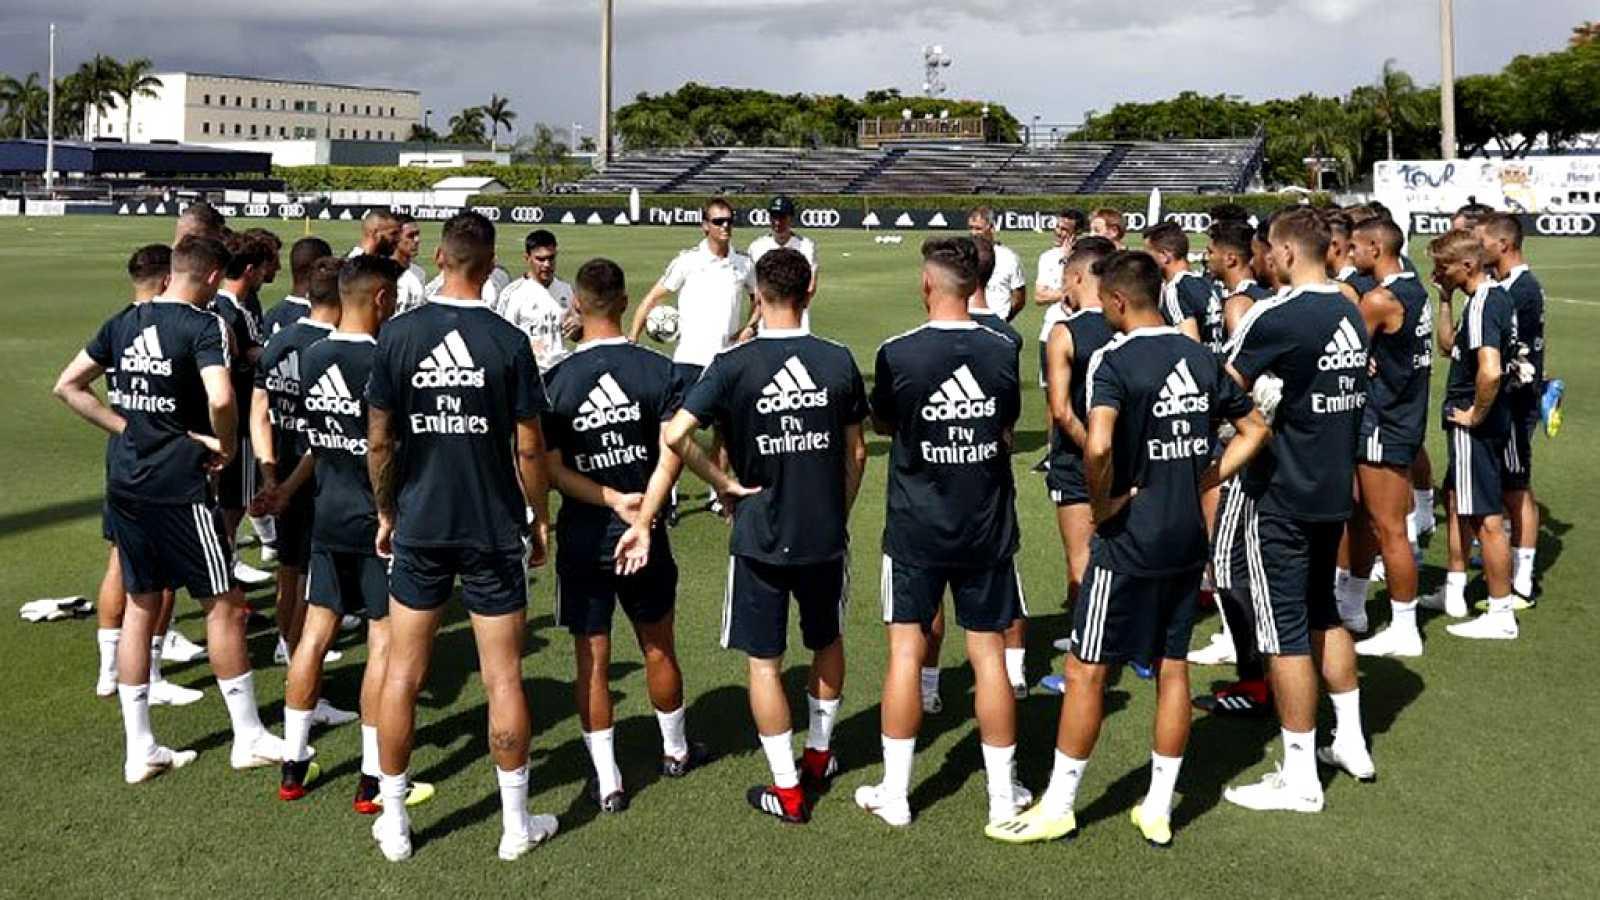 d81217eea3fdd El Real Madrid ya entrena en Miami a pesar de las tormentas ...